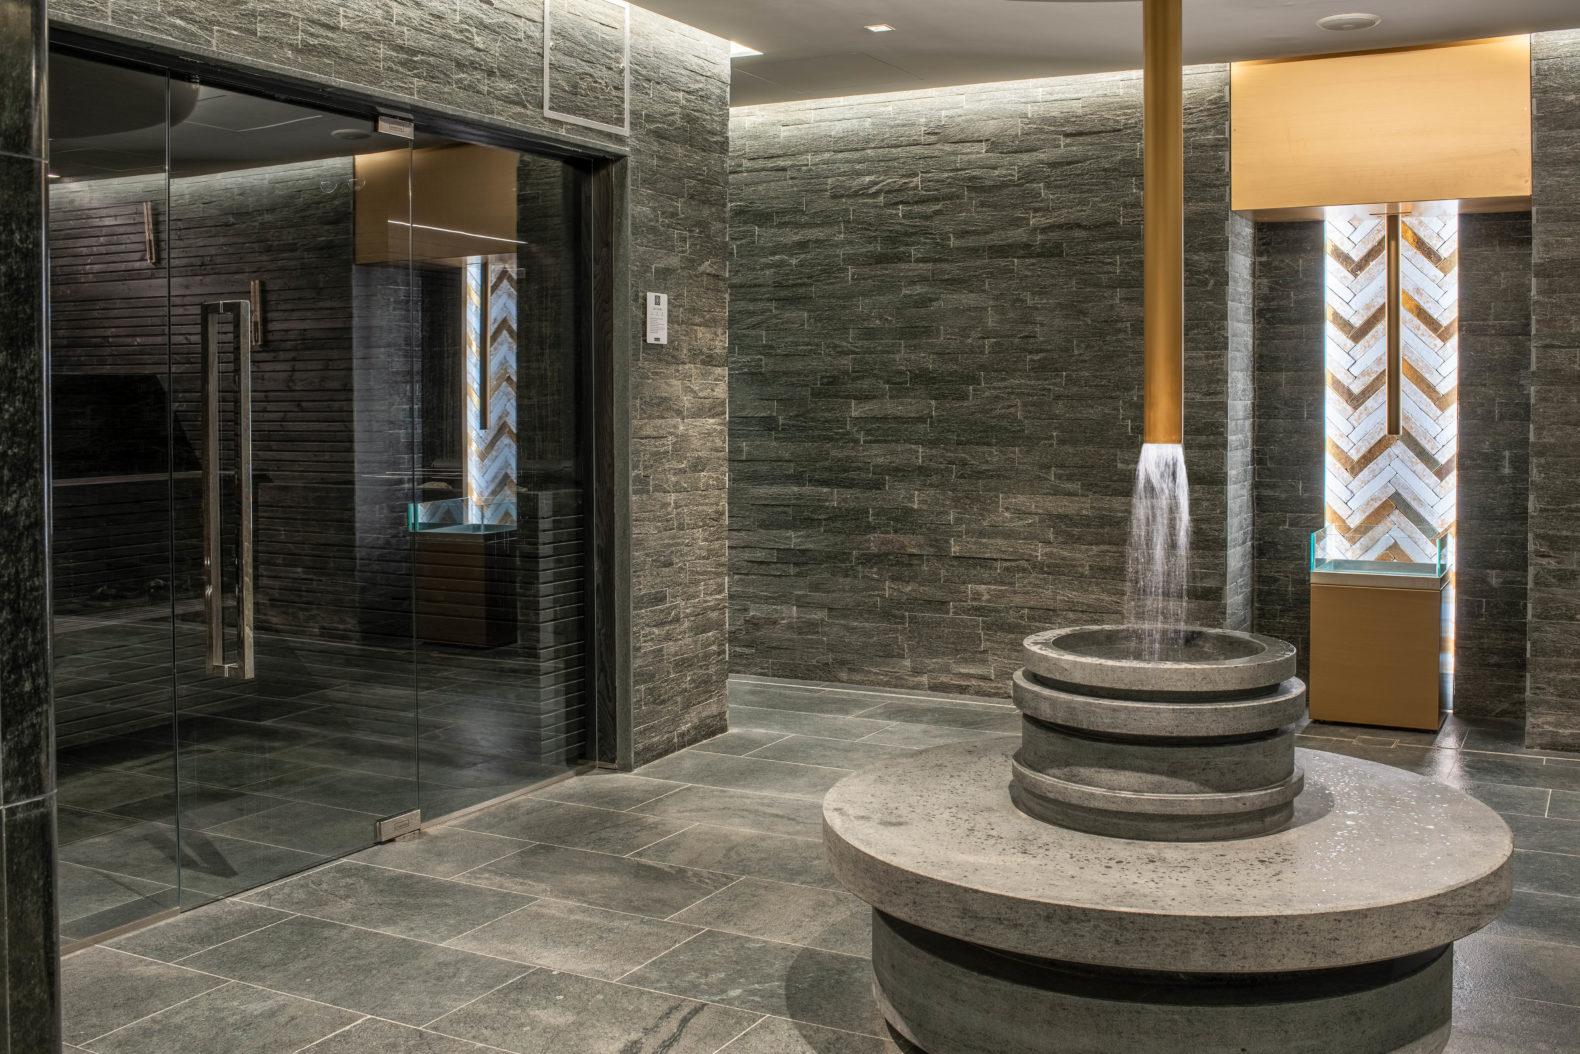 indoor-spa-area-sauna-grand-hotel-castrocaro-longlife-formula-italy